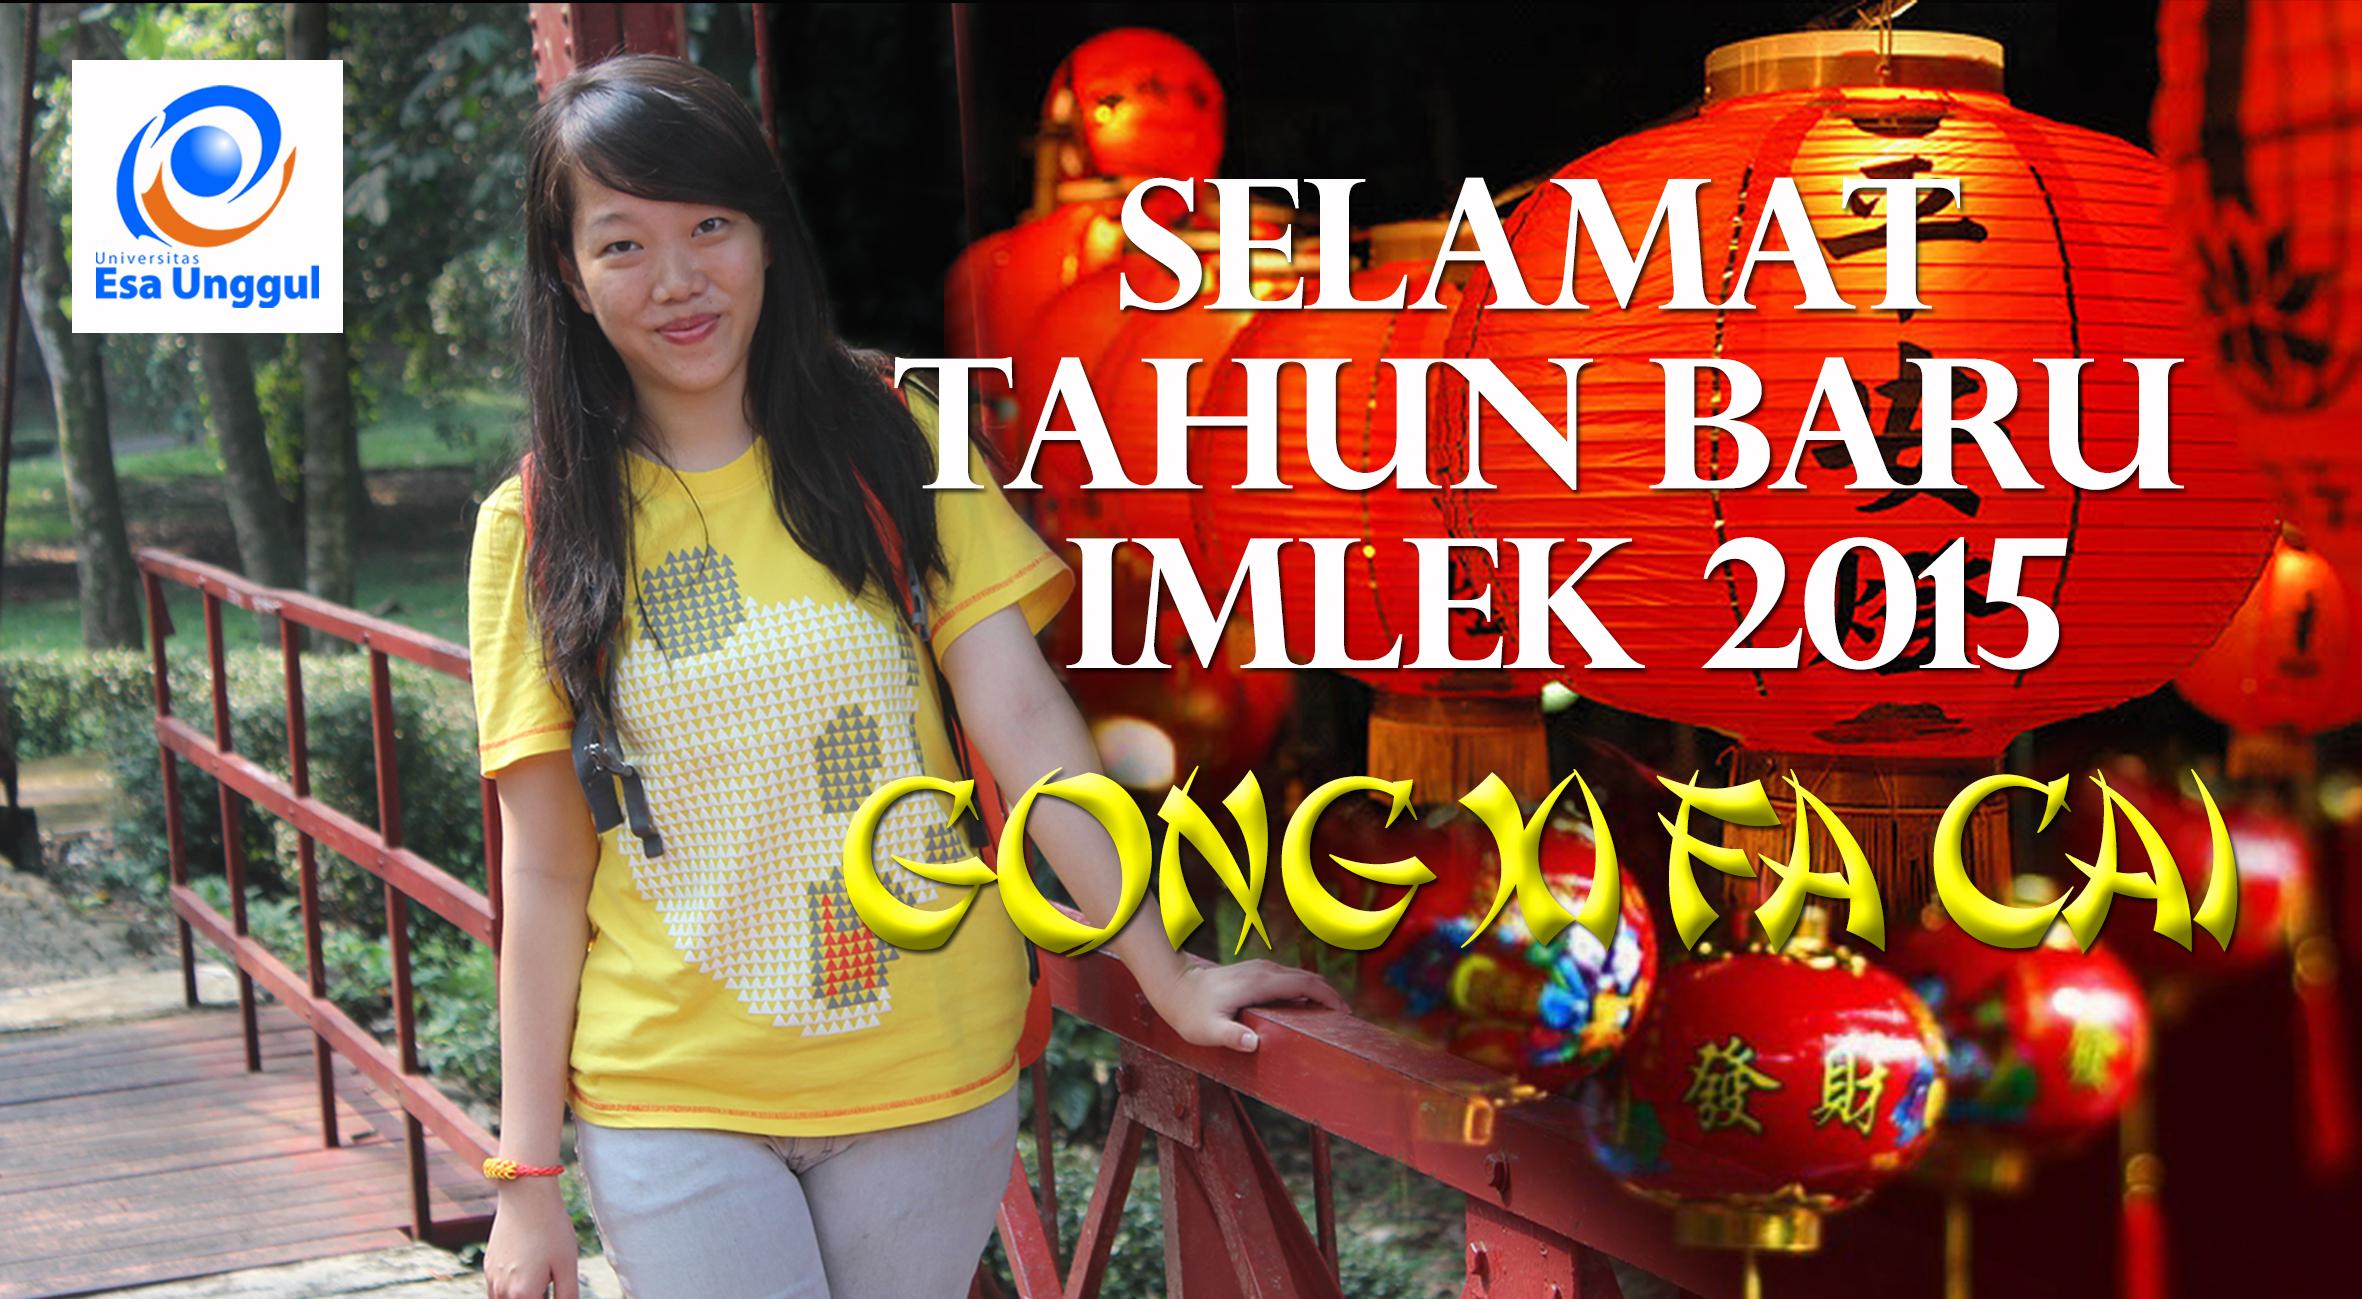 Universitas Esa Unggul mengucapkan Selamat Tahun Baru Imlek 2015